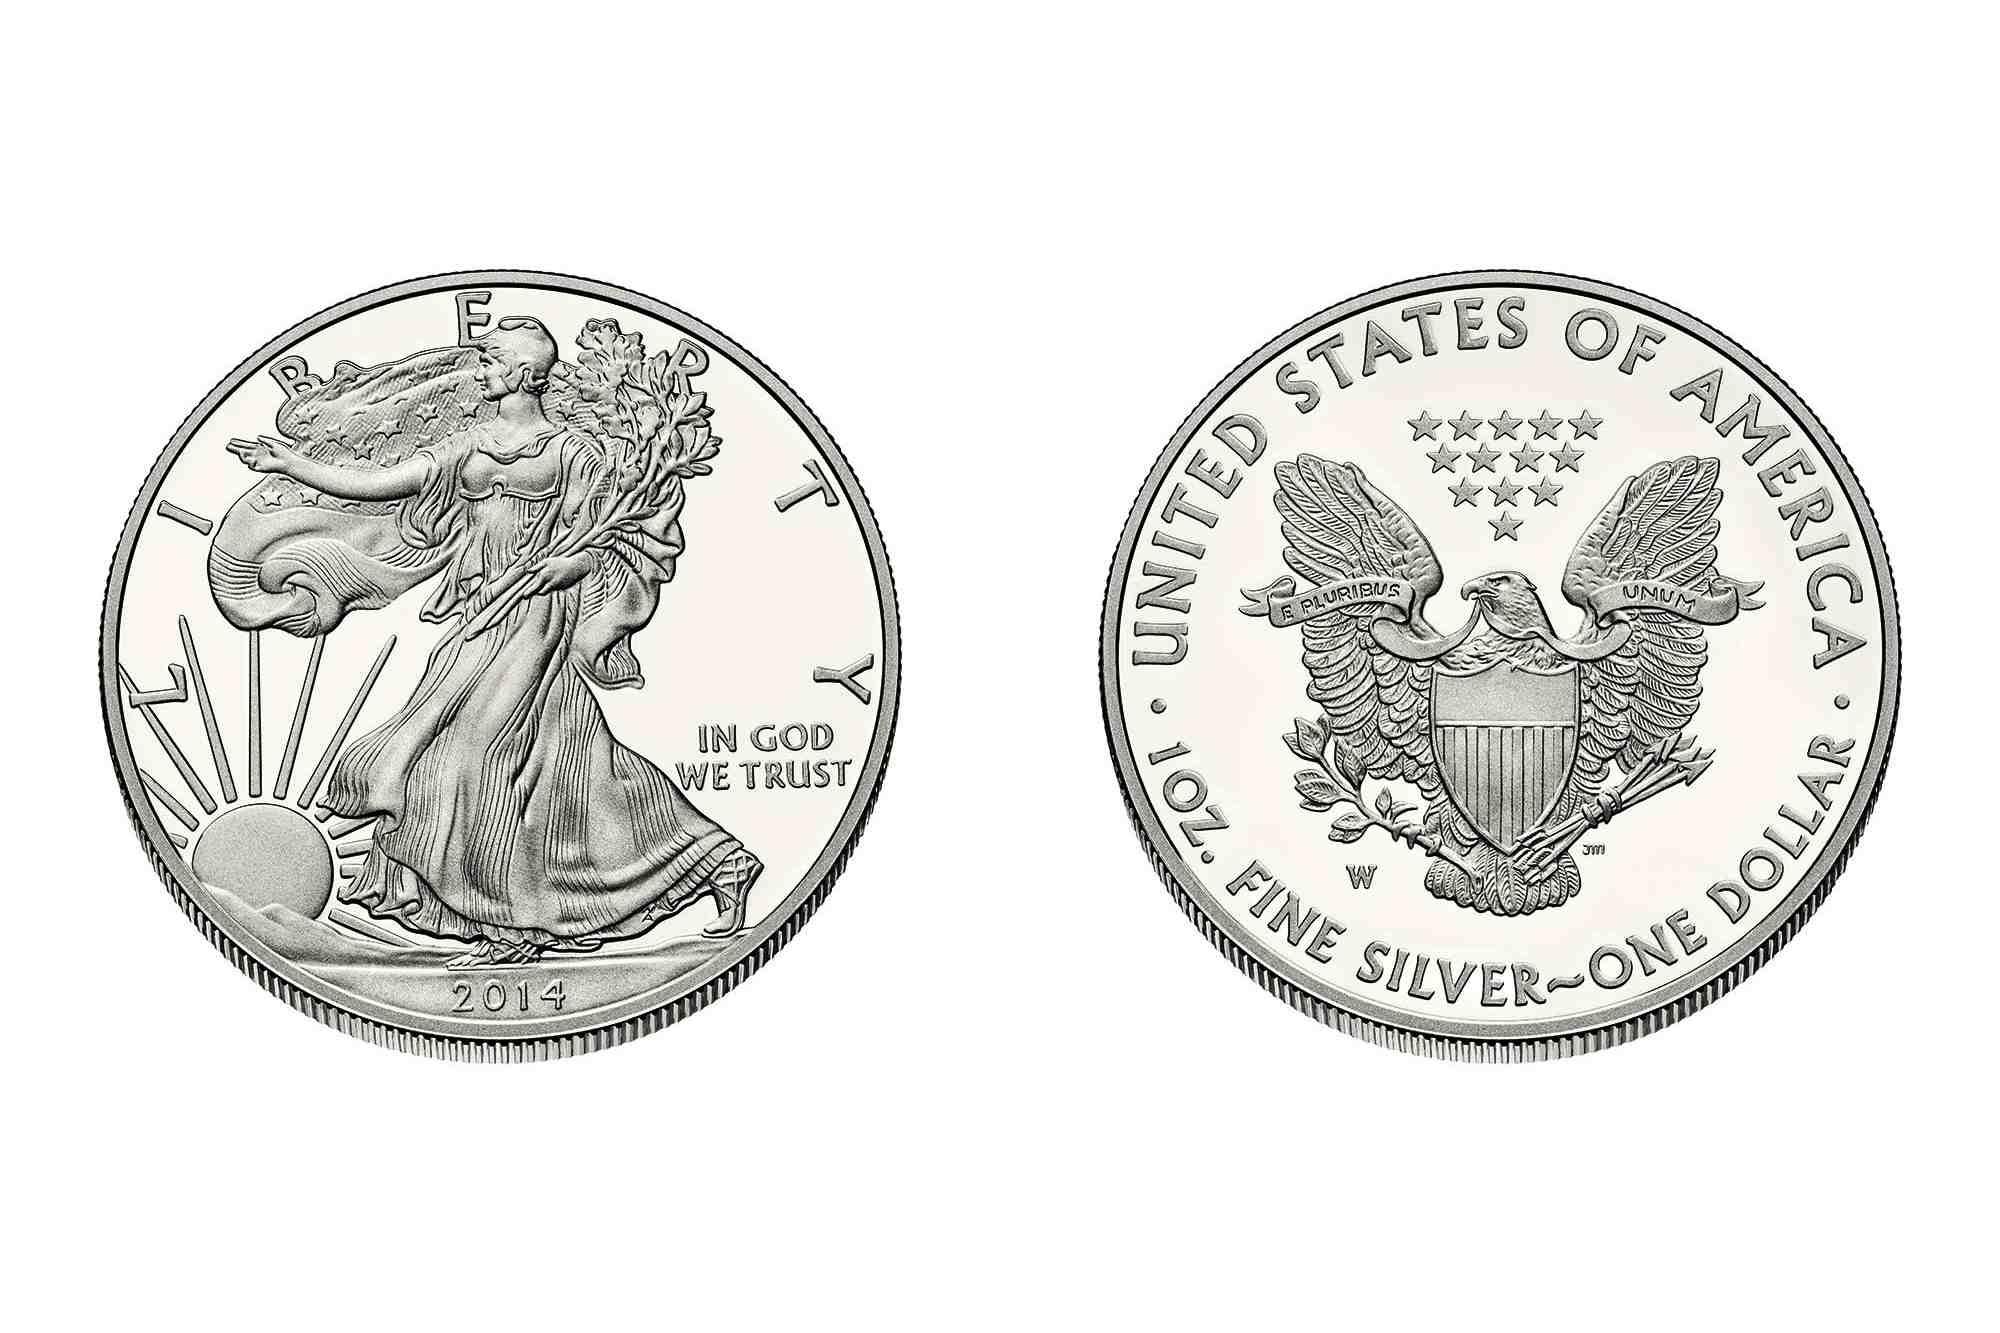 2014-American-Eagle-Silver-Proof-lg.jpg